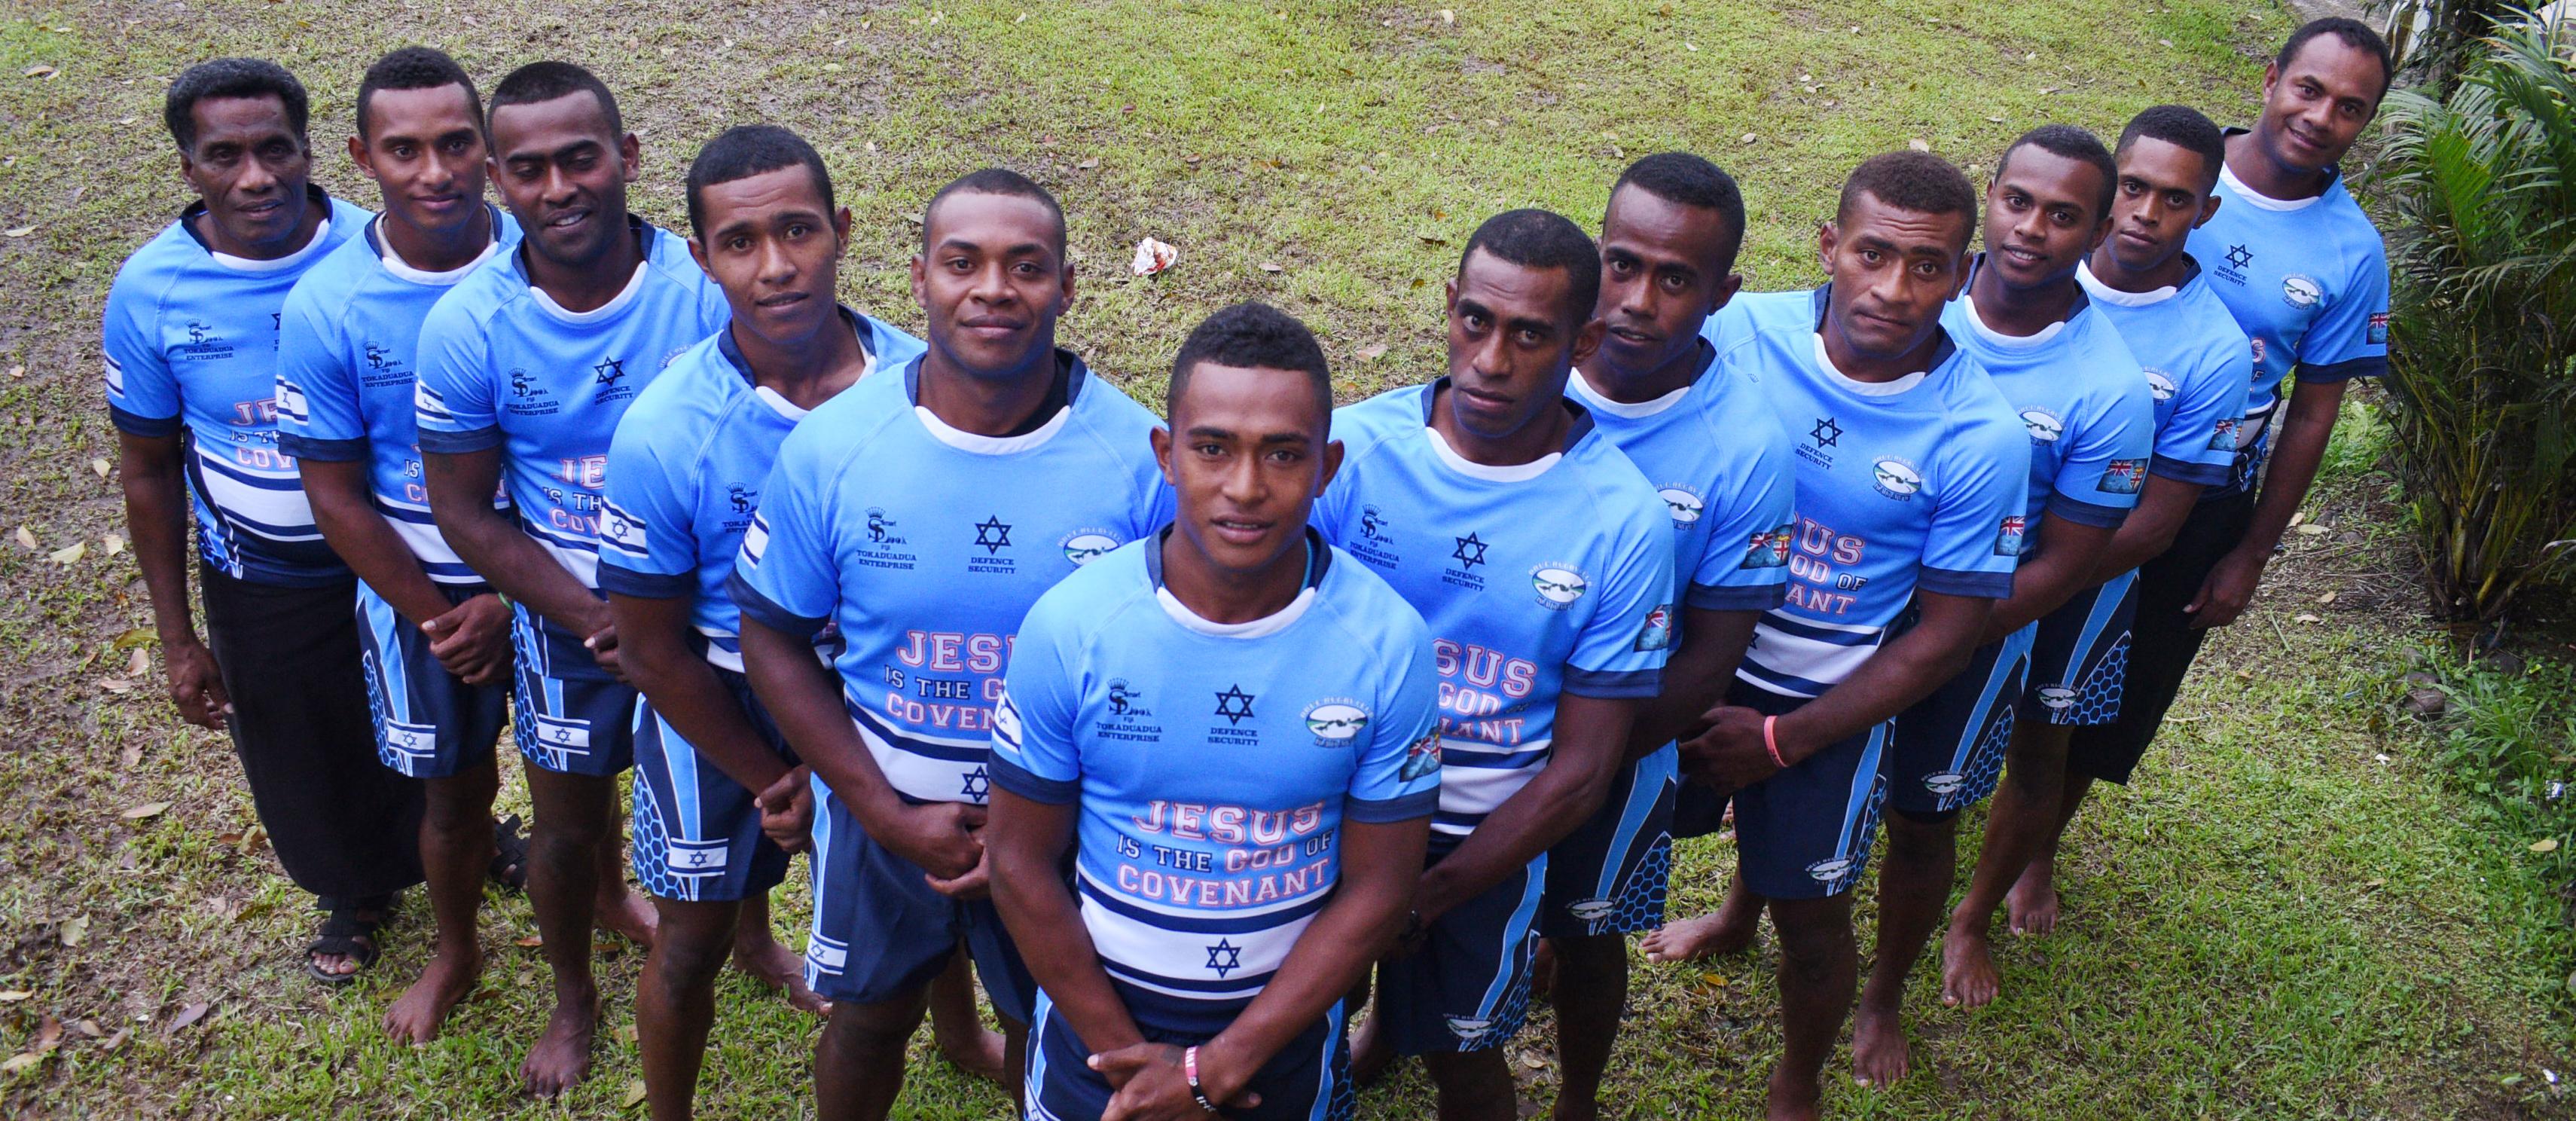 From left: Maciu Vakaloloma (official), Epeli Q, Epeli Litidamu, Peni Mataka, Apakuki Ceula, Peni Siganisucu, Vilikesa Bale,  Amenatave Waqa, Kelevi Toloi, Tevita Boi, Solomoni Lovoti, Samuela Ratini (coach) at Tamavua, Suva on September 12, 2017.  Photo: Ronald Kumar